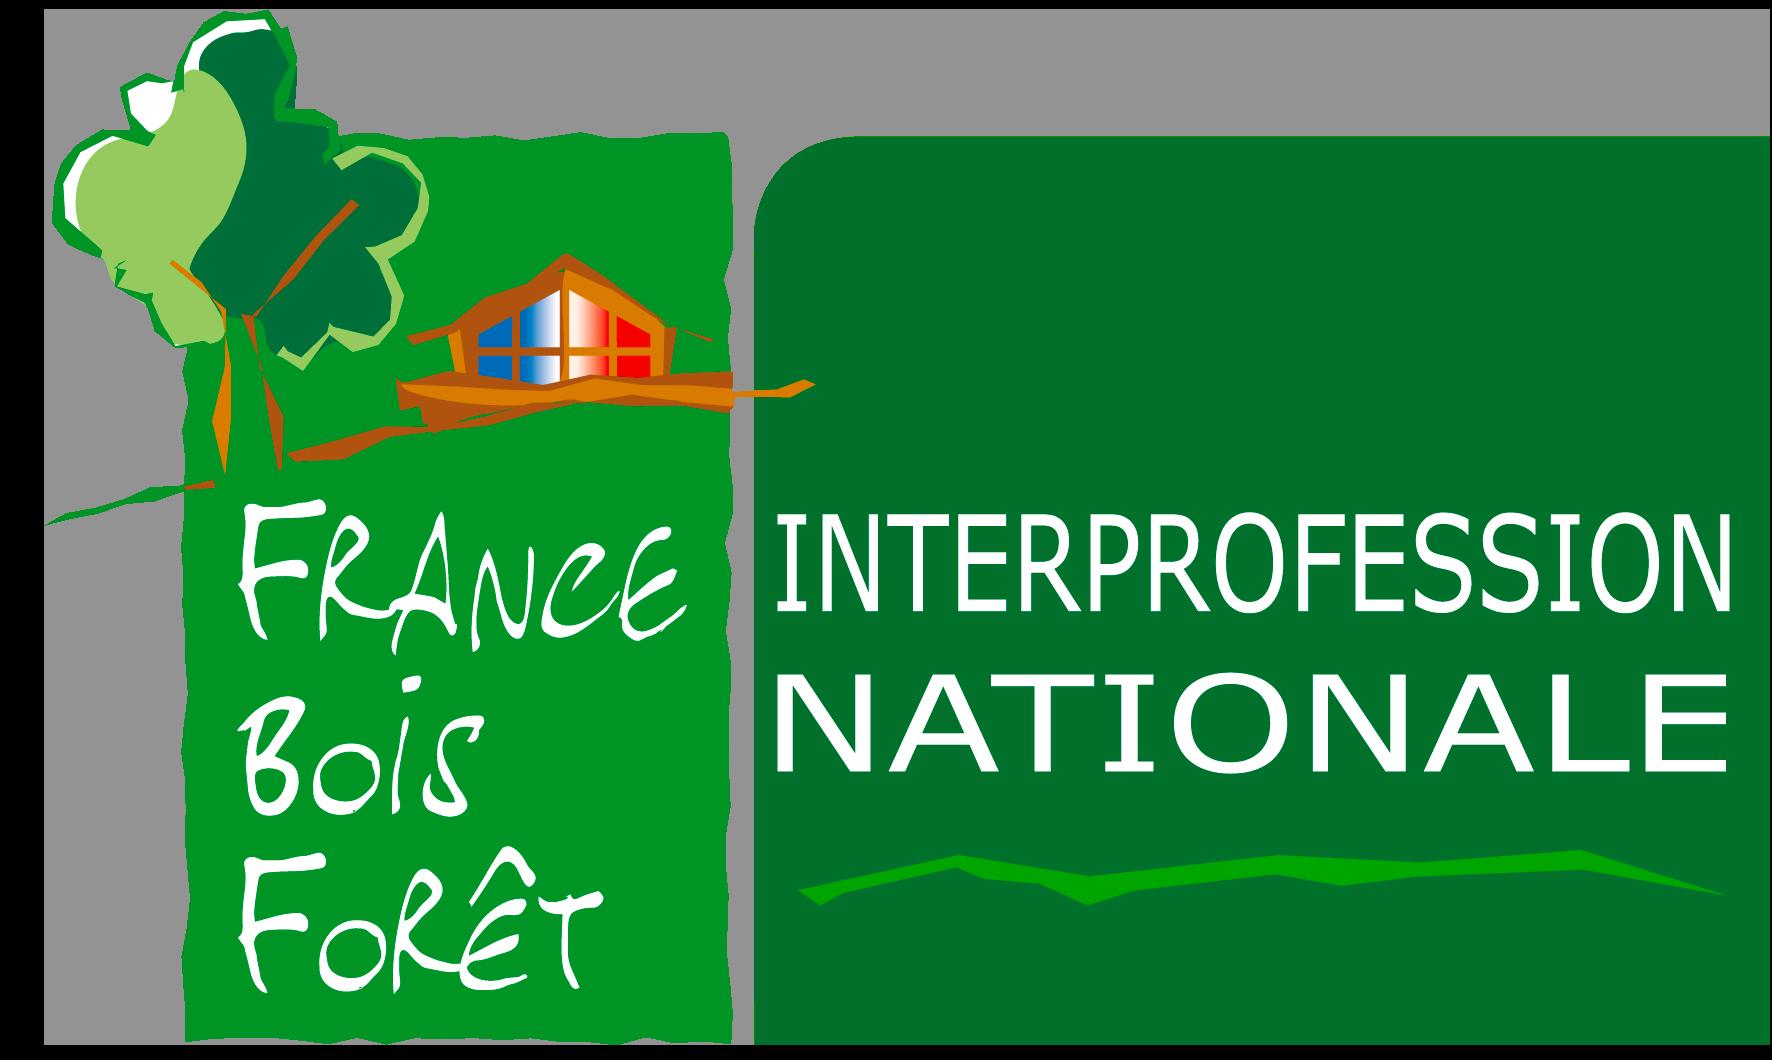 logo france bois foret